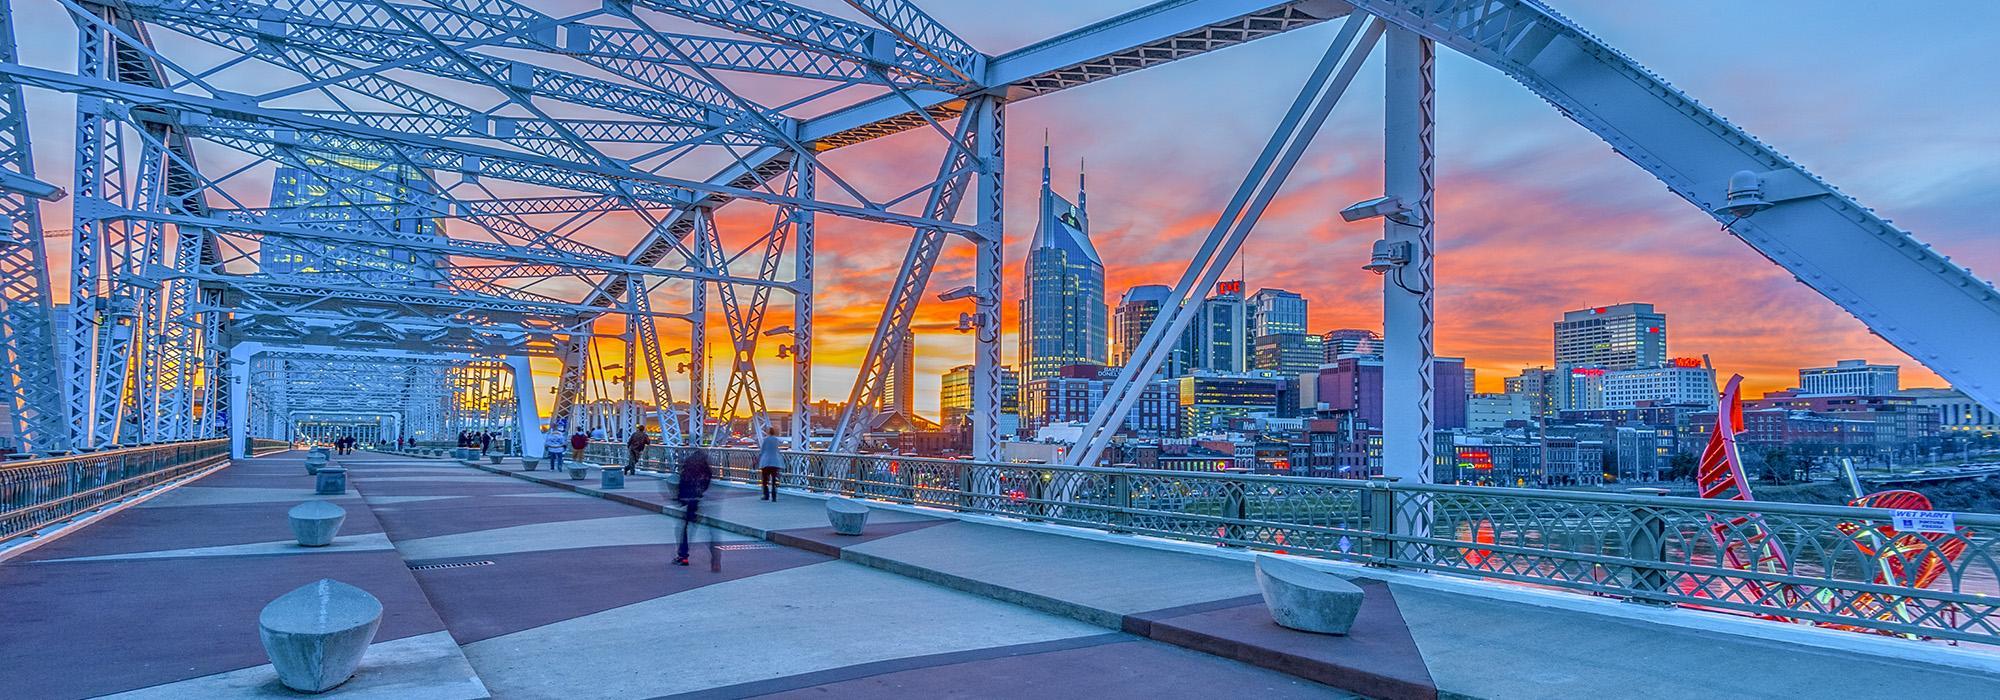 TN_Nashville_JohnSeigenthalerPedestrianBridge_courtesyNashvilleDowntownPartnership_2016_001_Hero.jpg